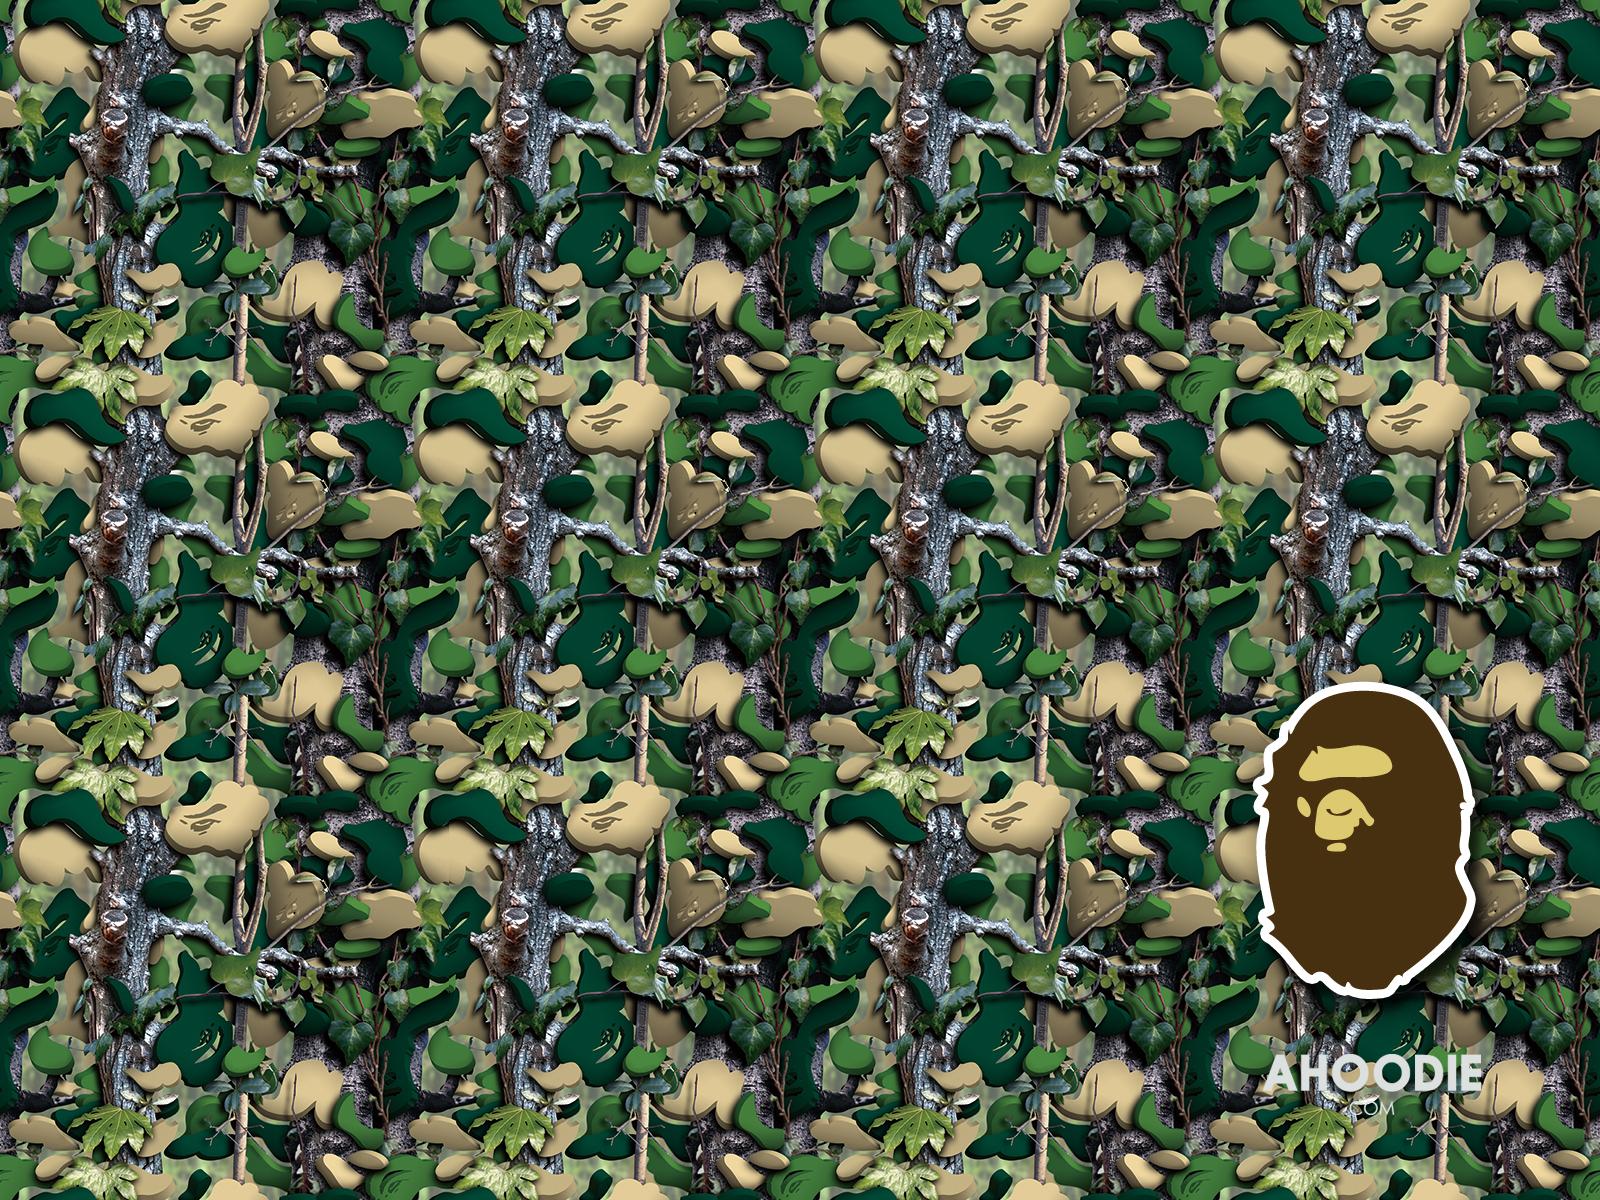 Bape Iphone Wallpaper Bape camo wall 1600x1200